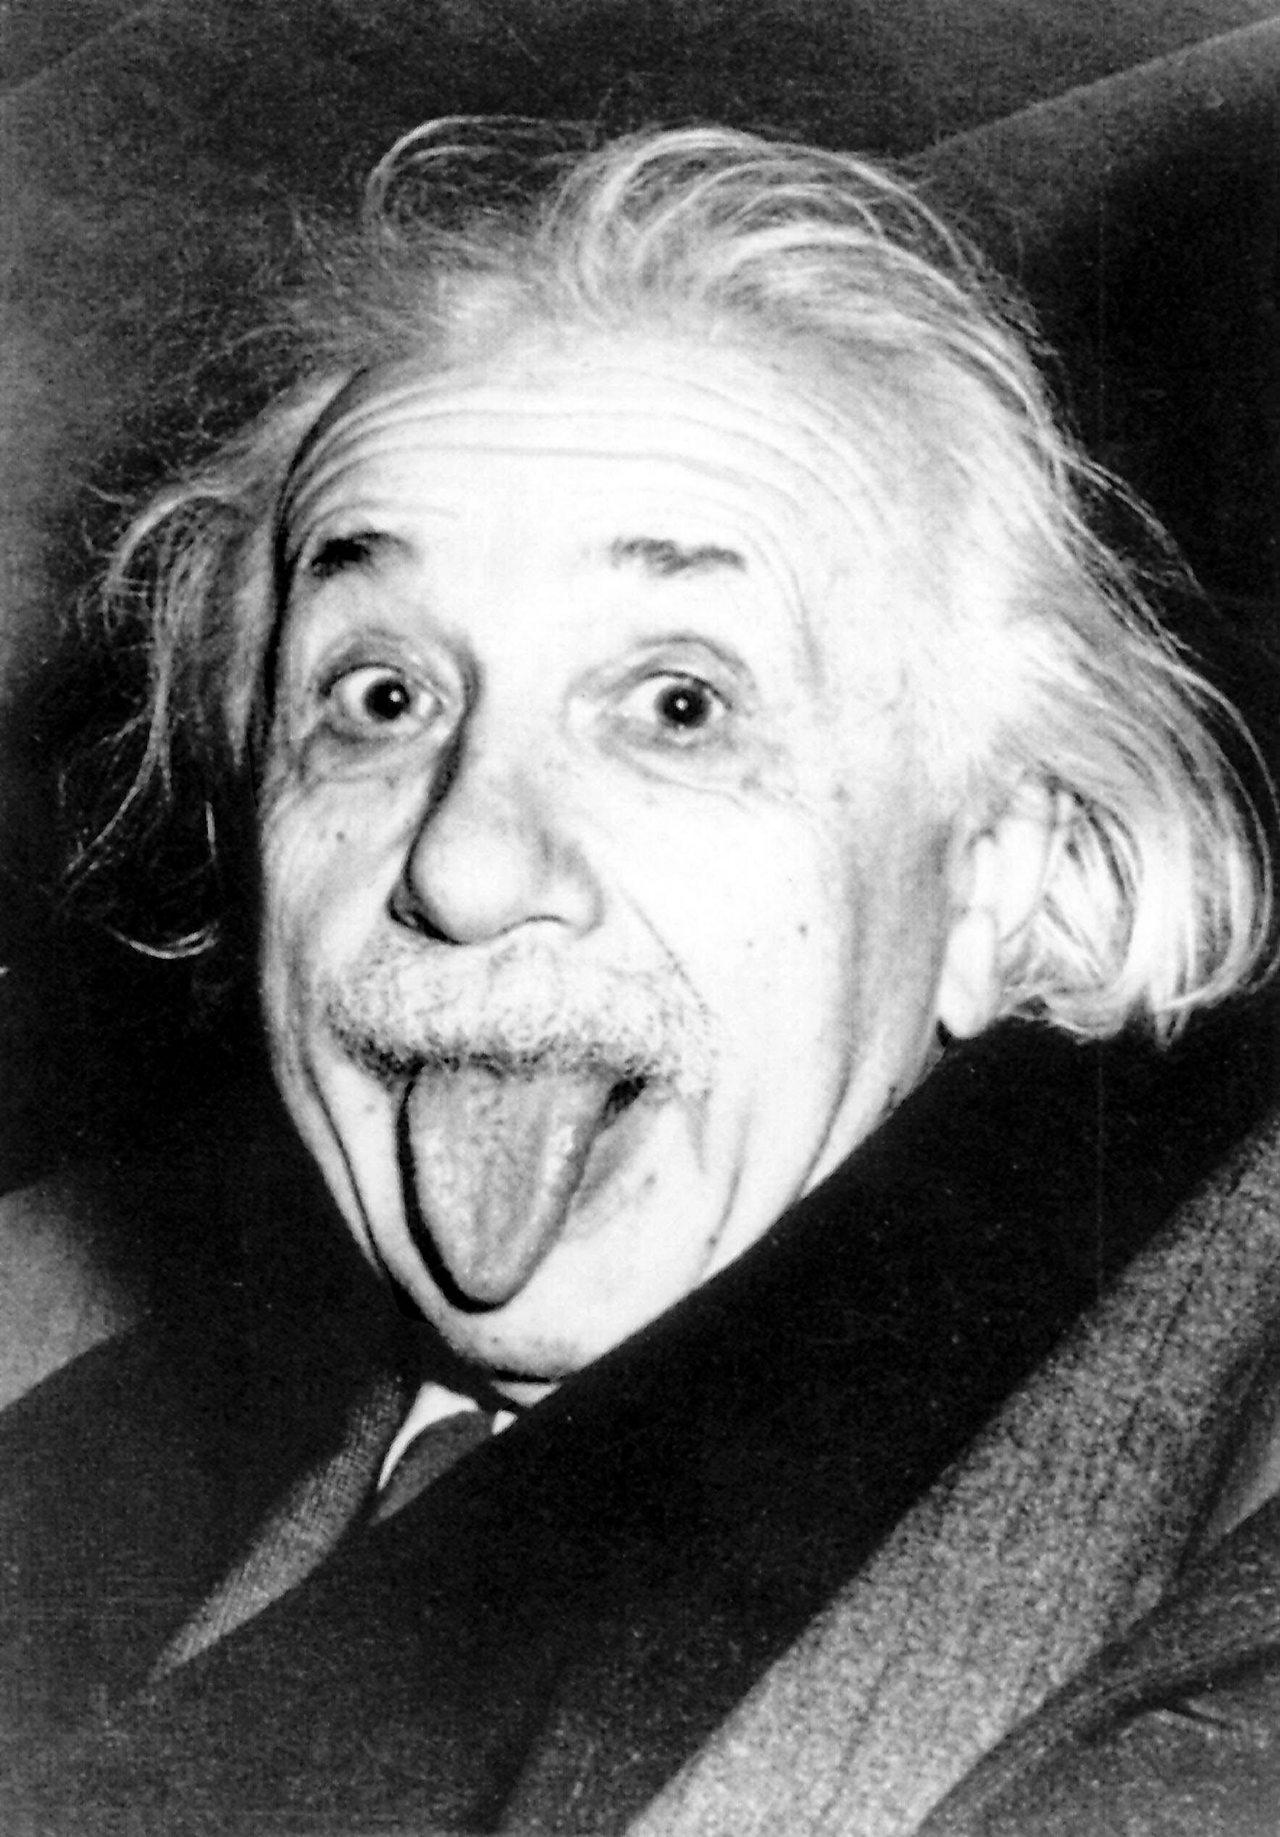 Albert Einstein sticking his tongue out